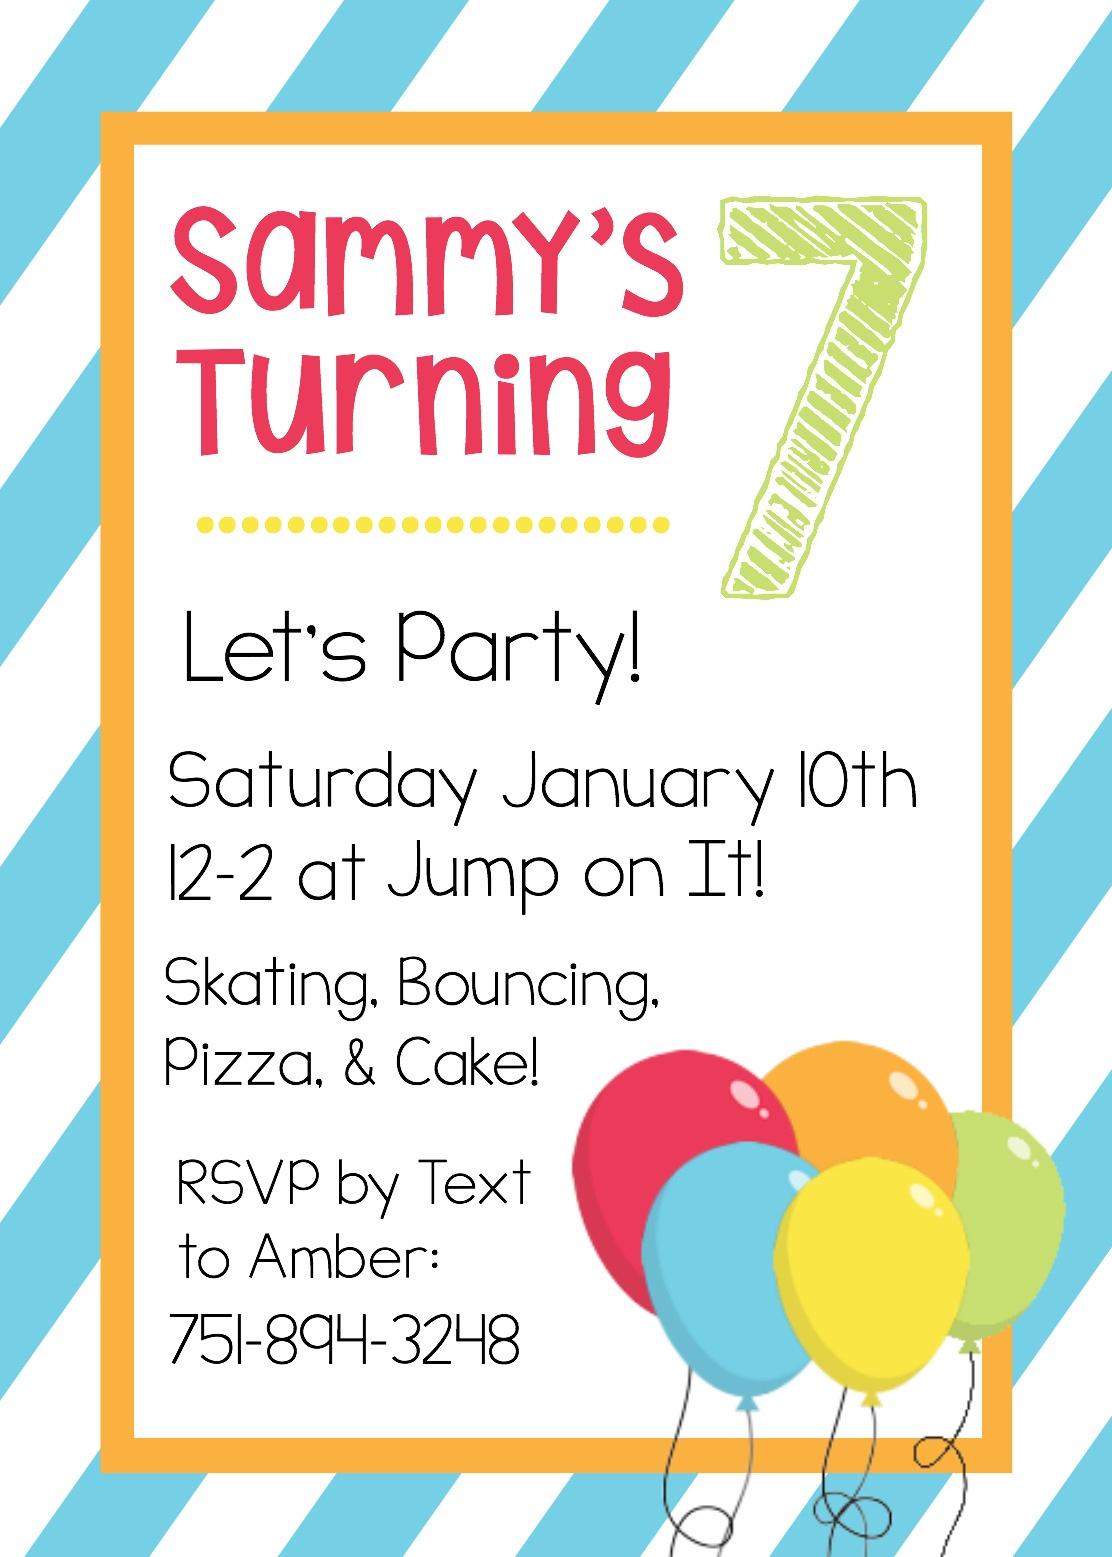 Free Printable Birthday Invitation Templates - Free Printable Invitation Maker